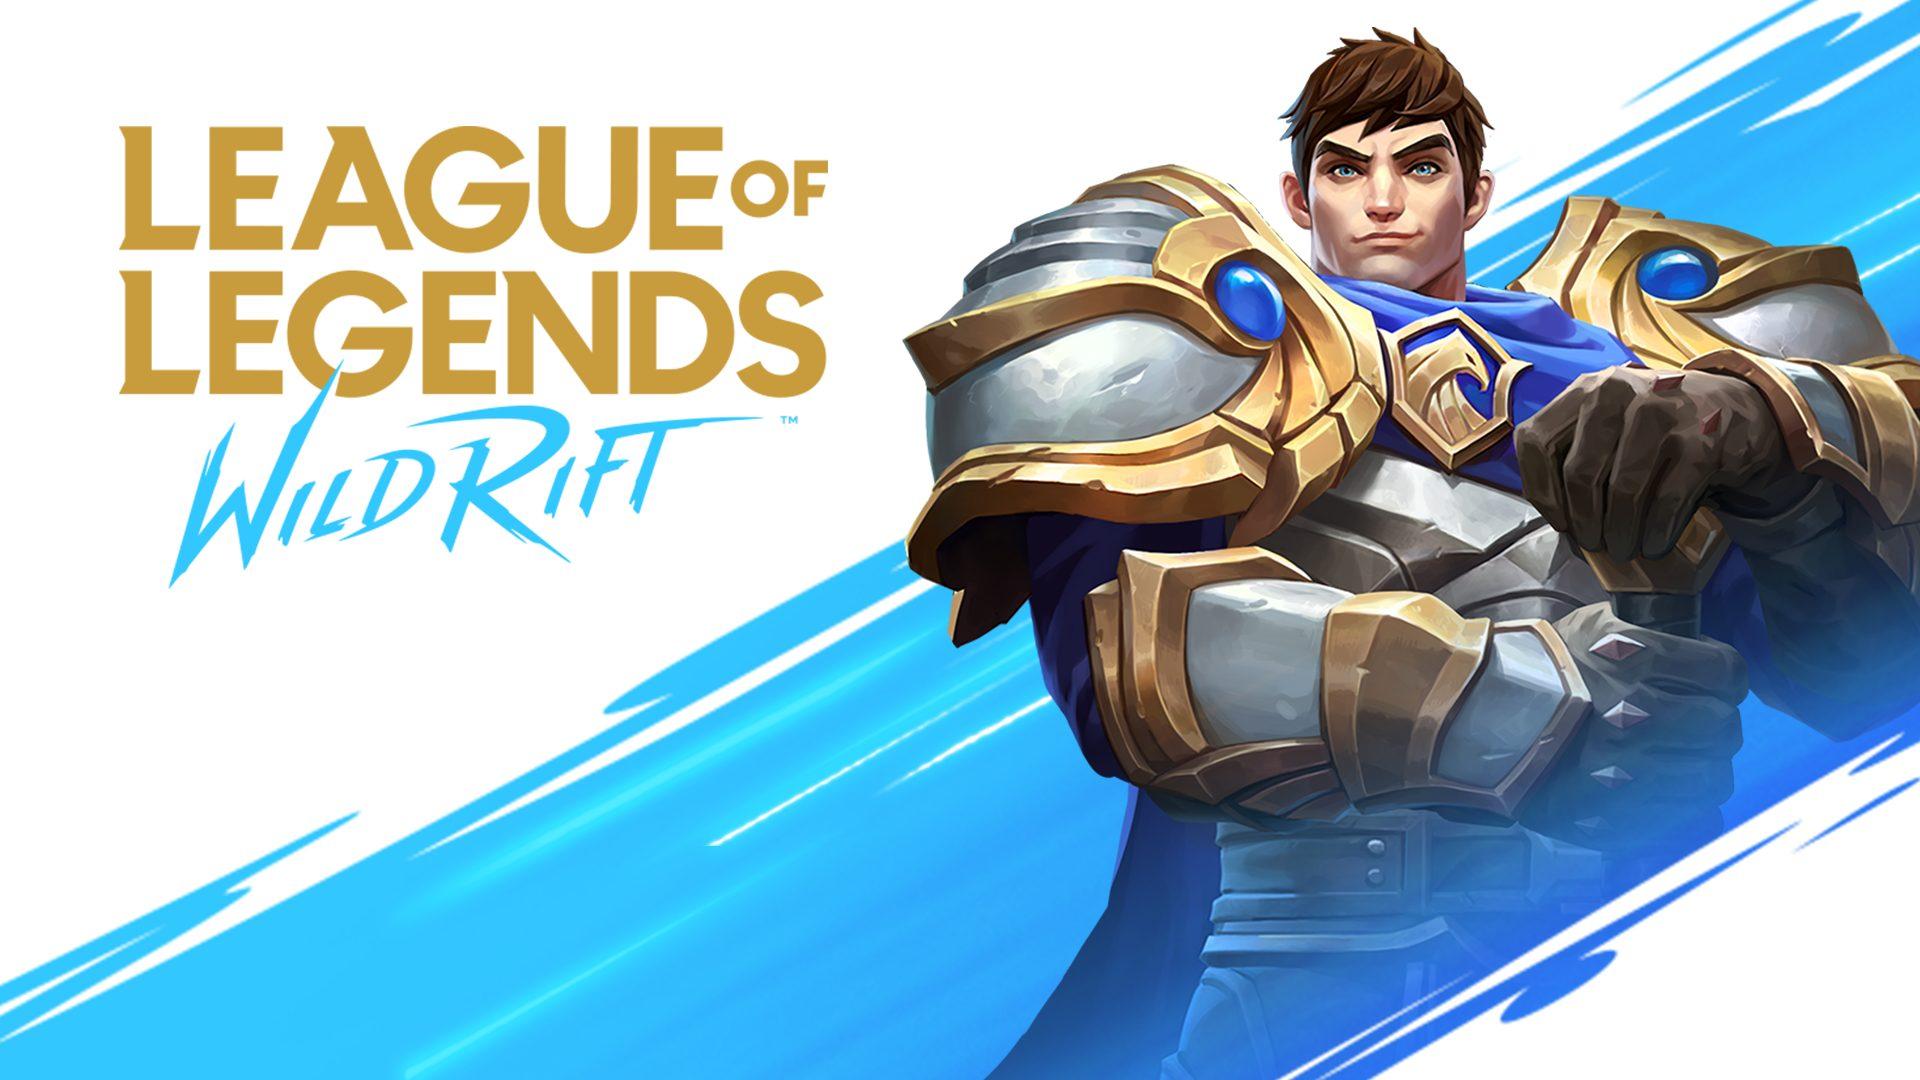 League of Legends Wilf Rift, parte la closed beta di alcune settimane thumbnail